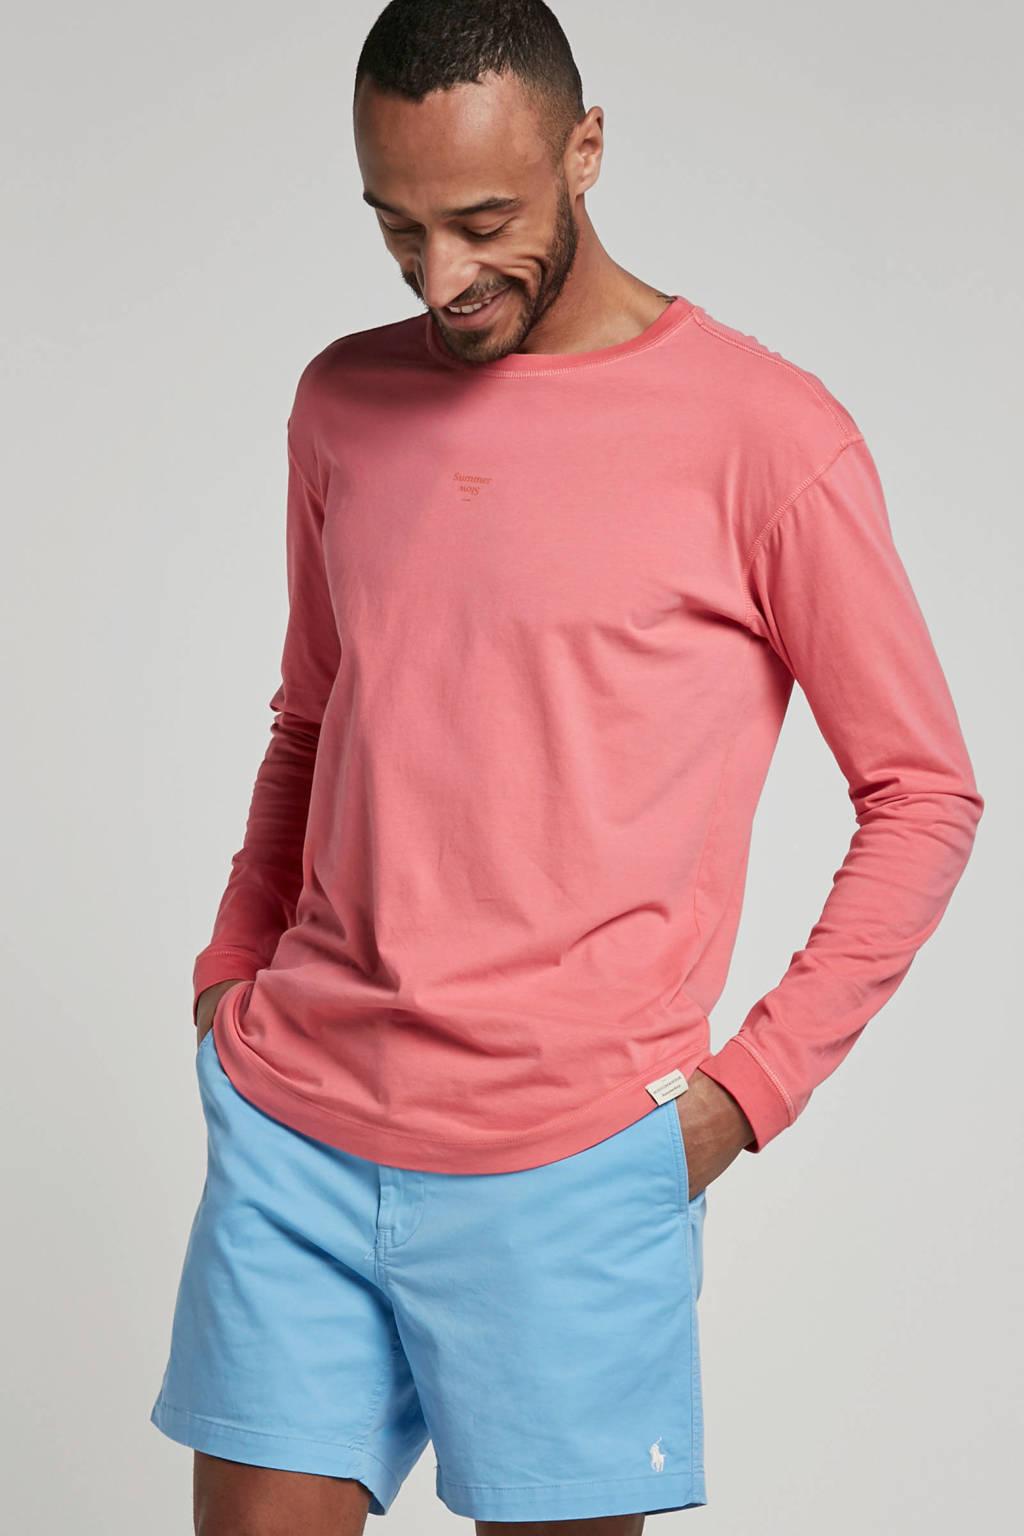 Scotch & Soda T-shirt lange mouw roze, Roze